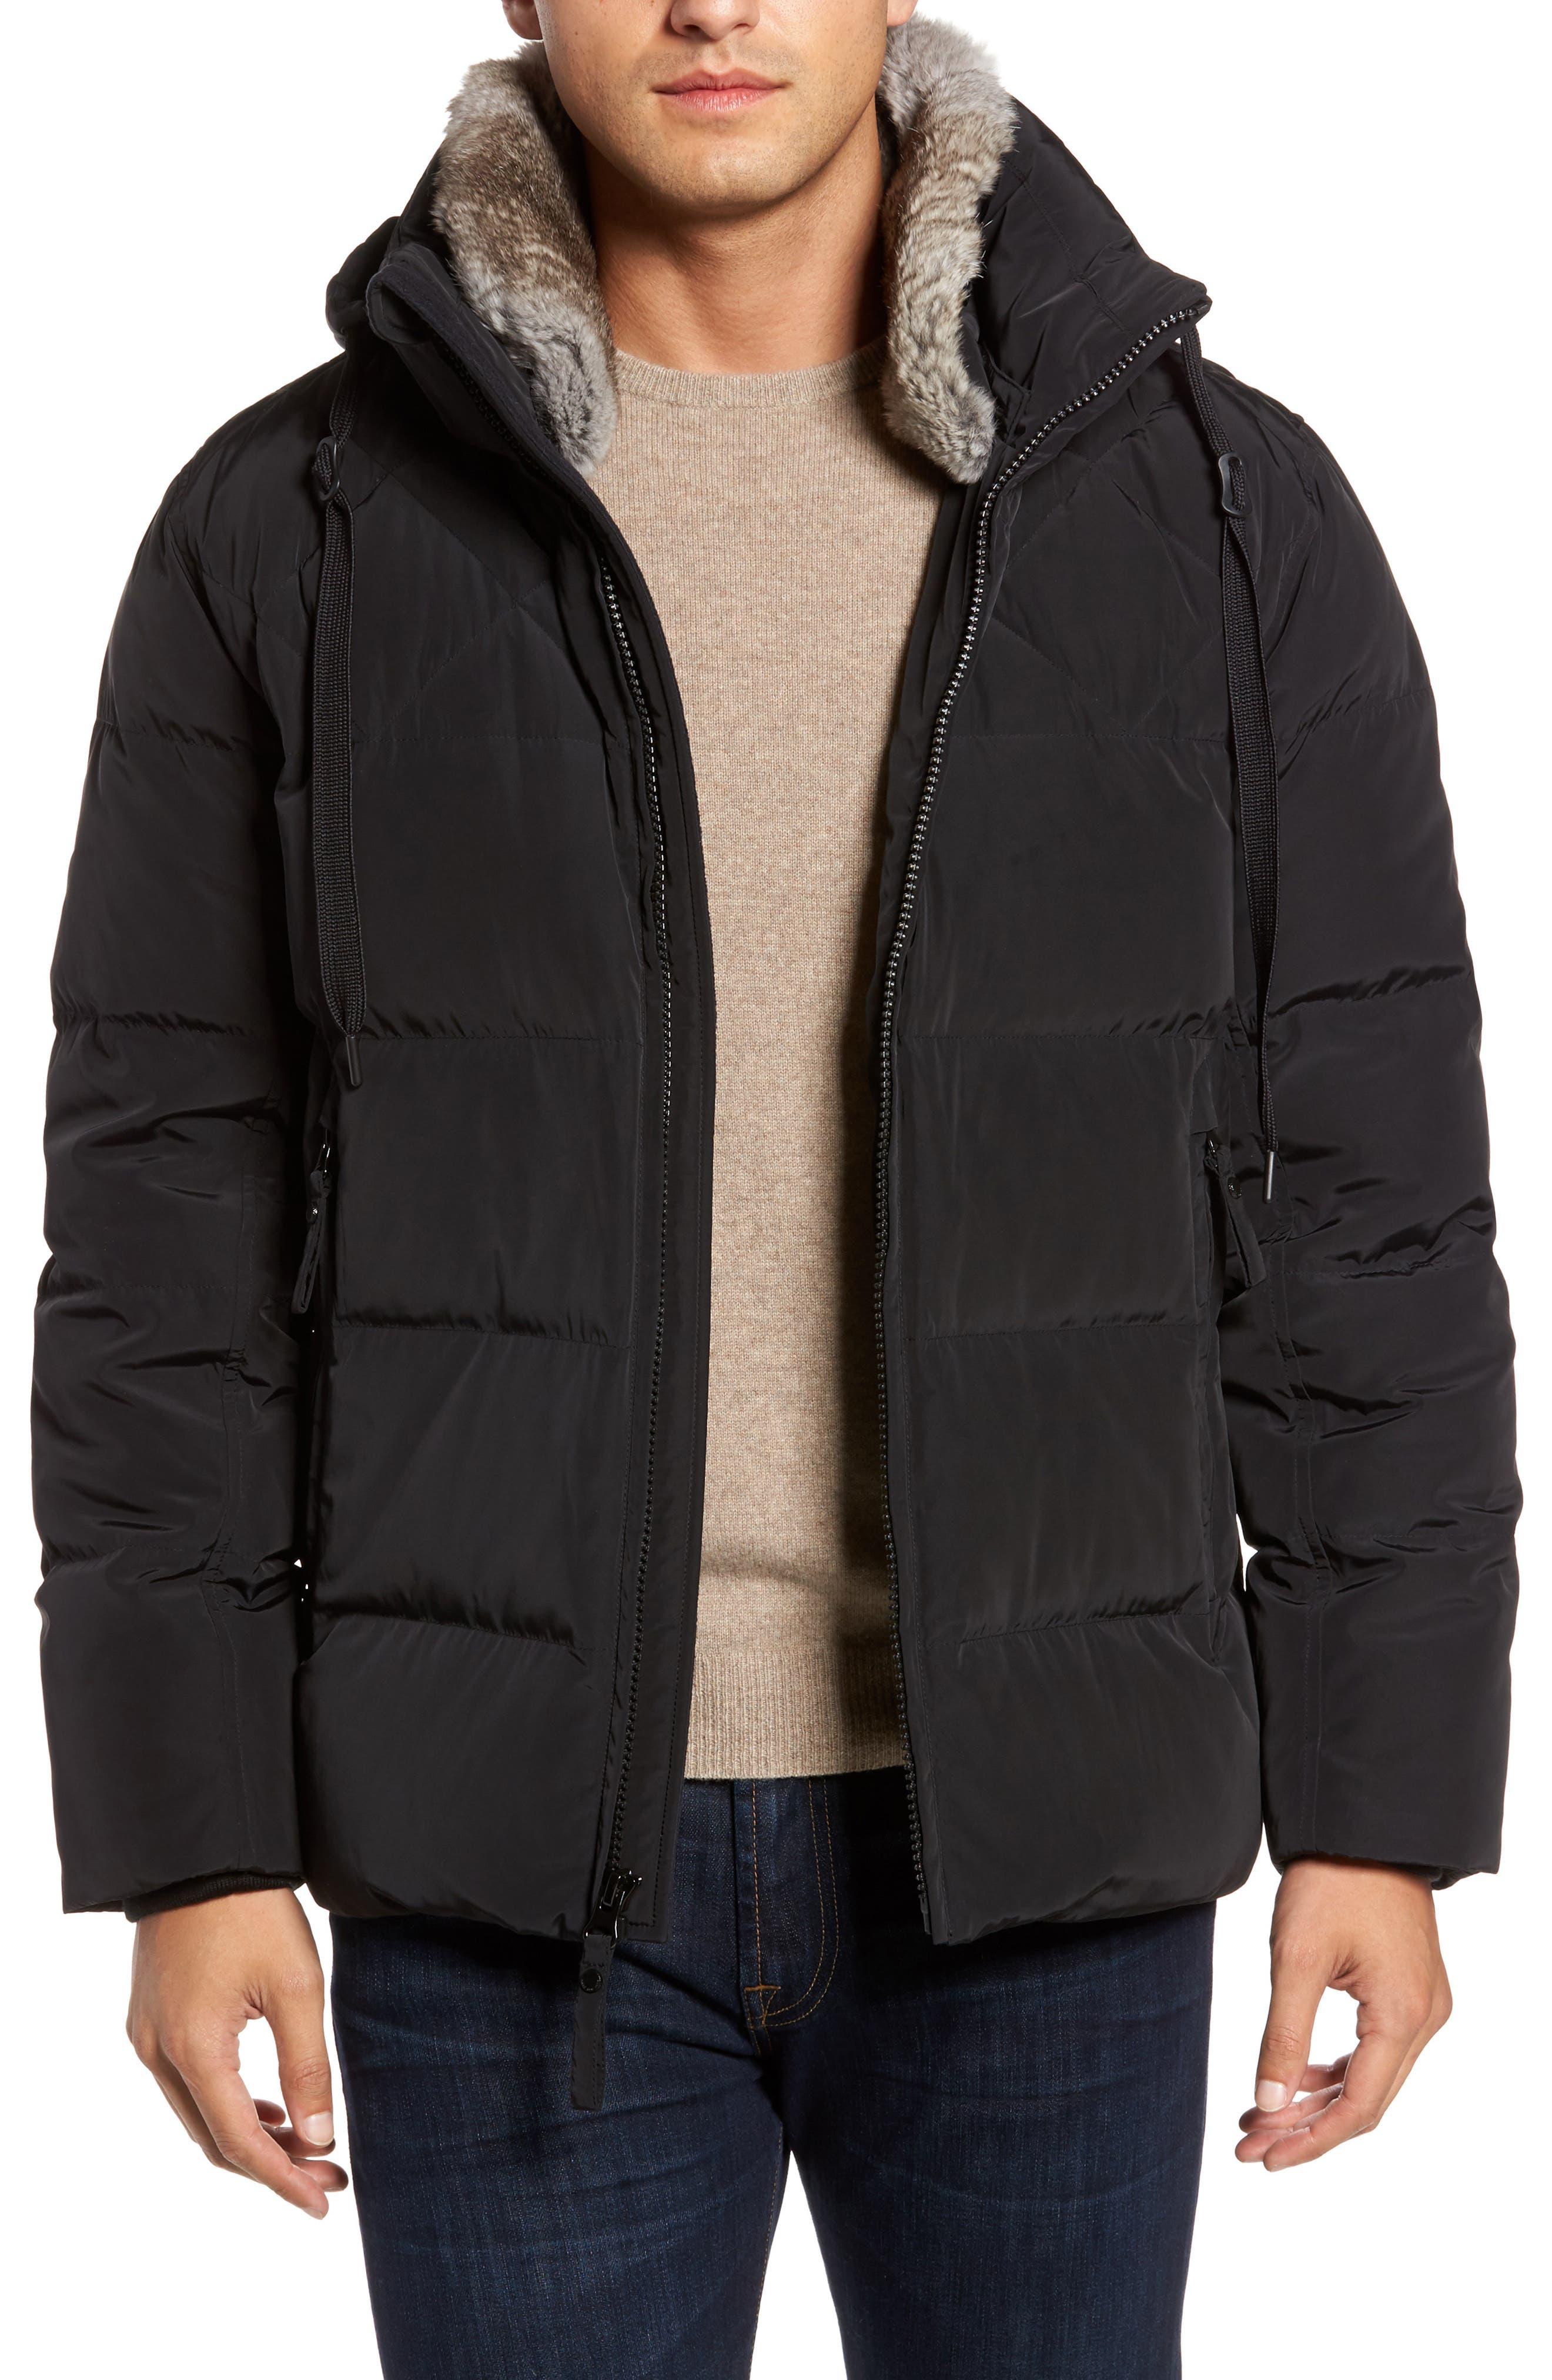 Navan Quilted Down Jacket with Genuine Rabbit Fur Trim,                             Main thumbnail 1, color,                             Black